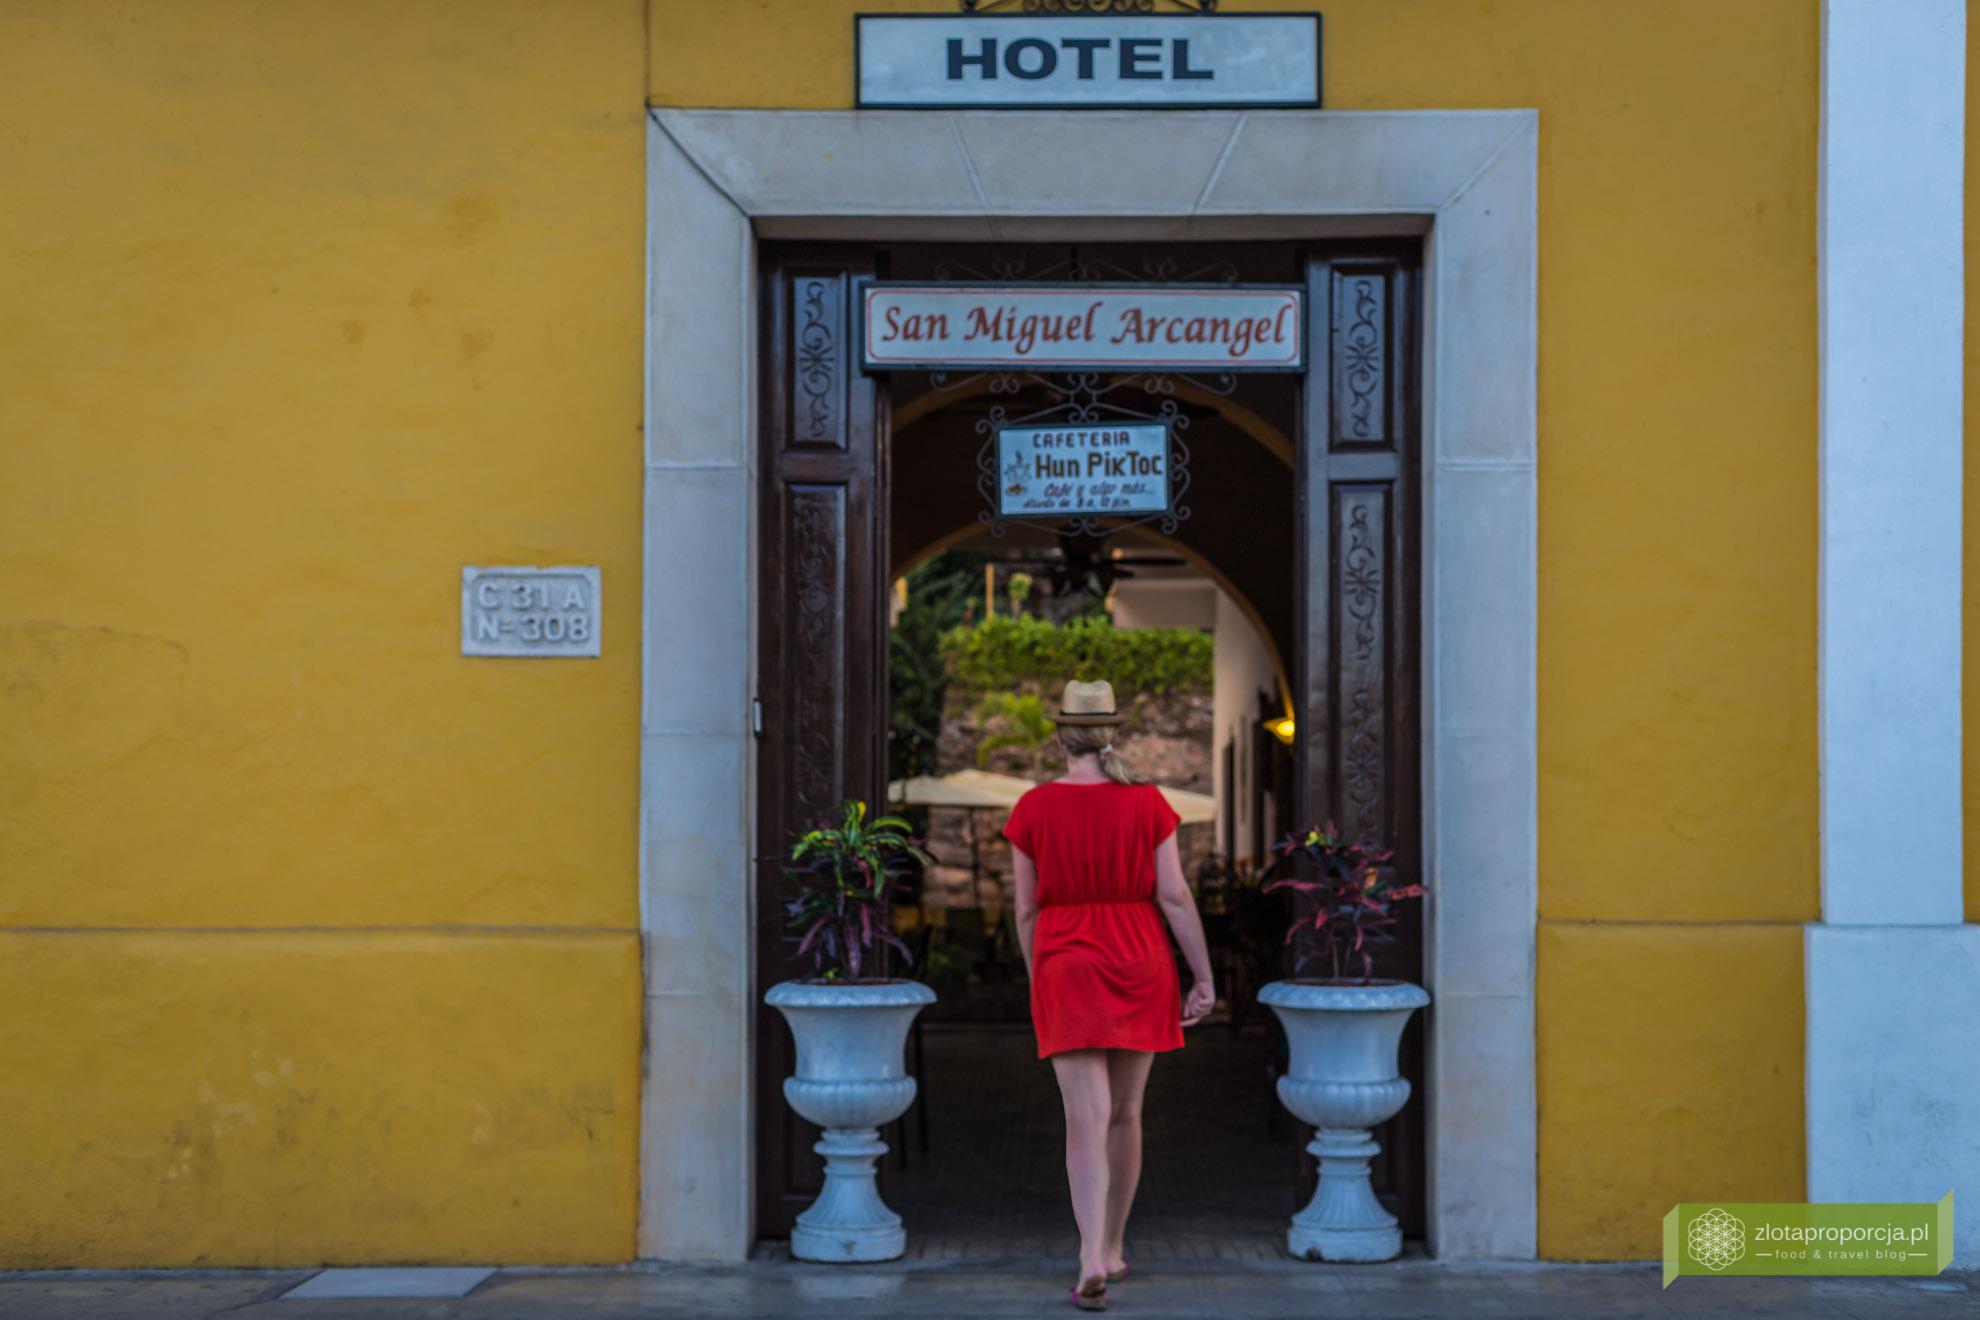 noclegi na Jukatania, nocleg w Izamal, Meksyk, Hotel San Miguel Arcangel